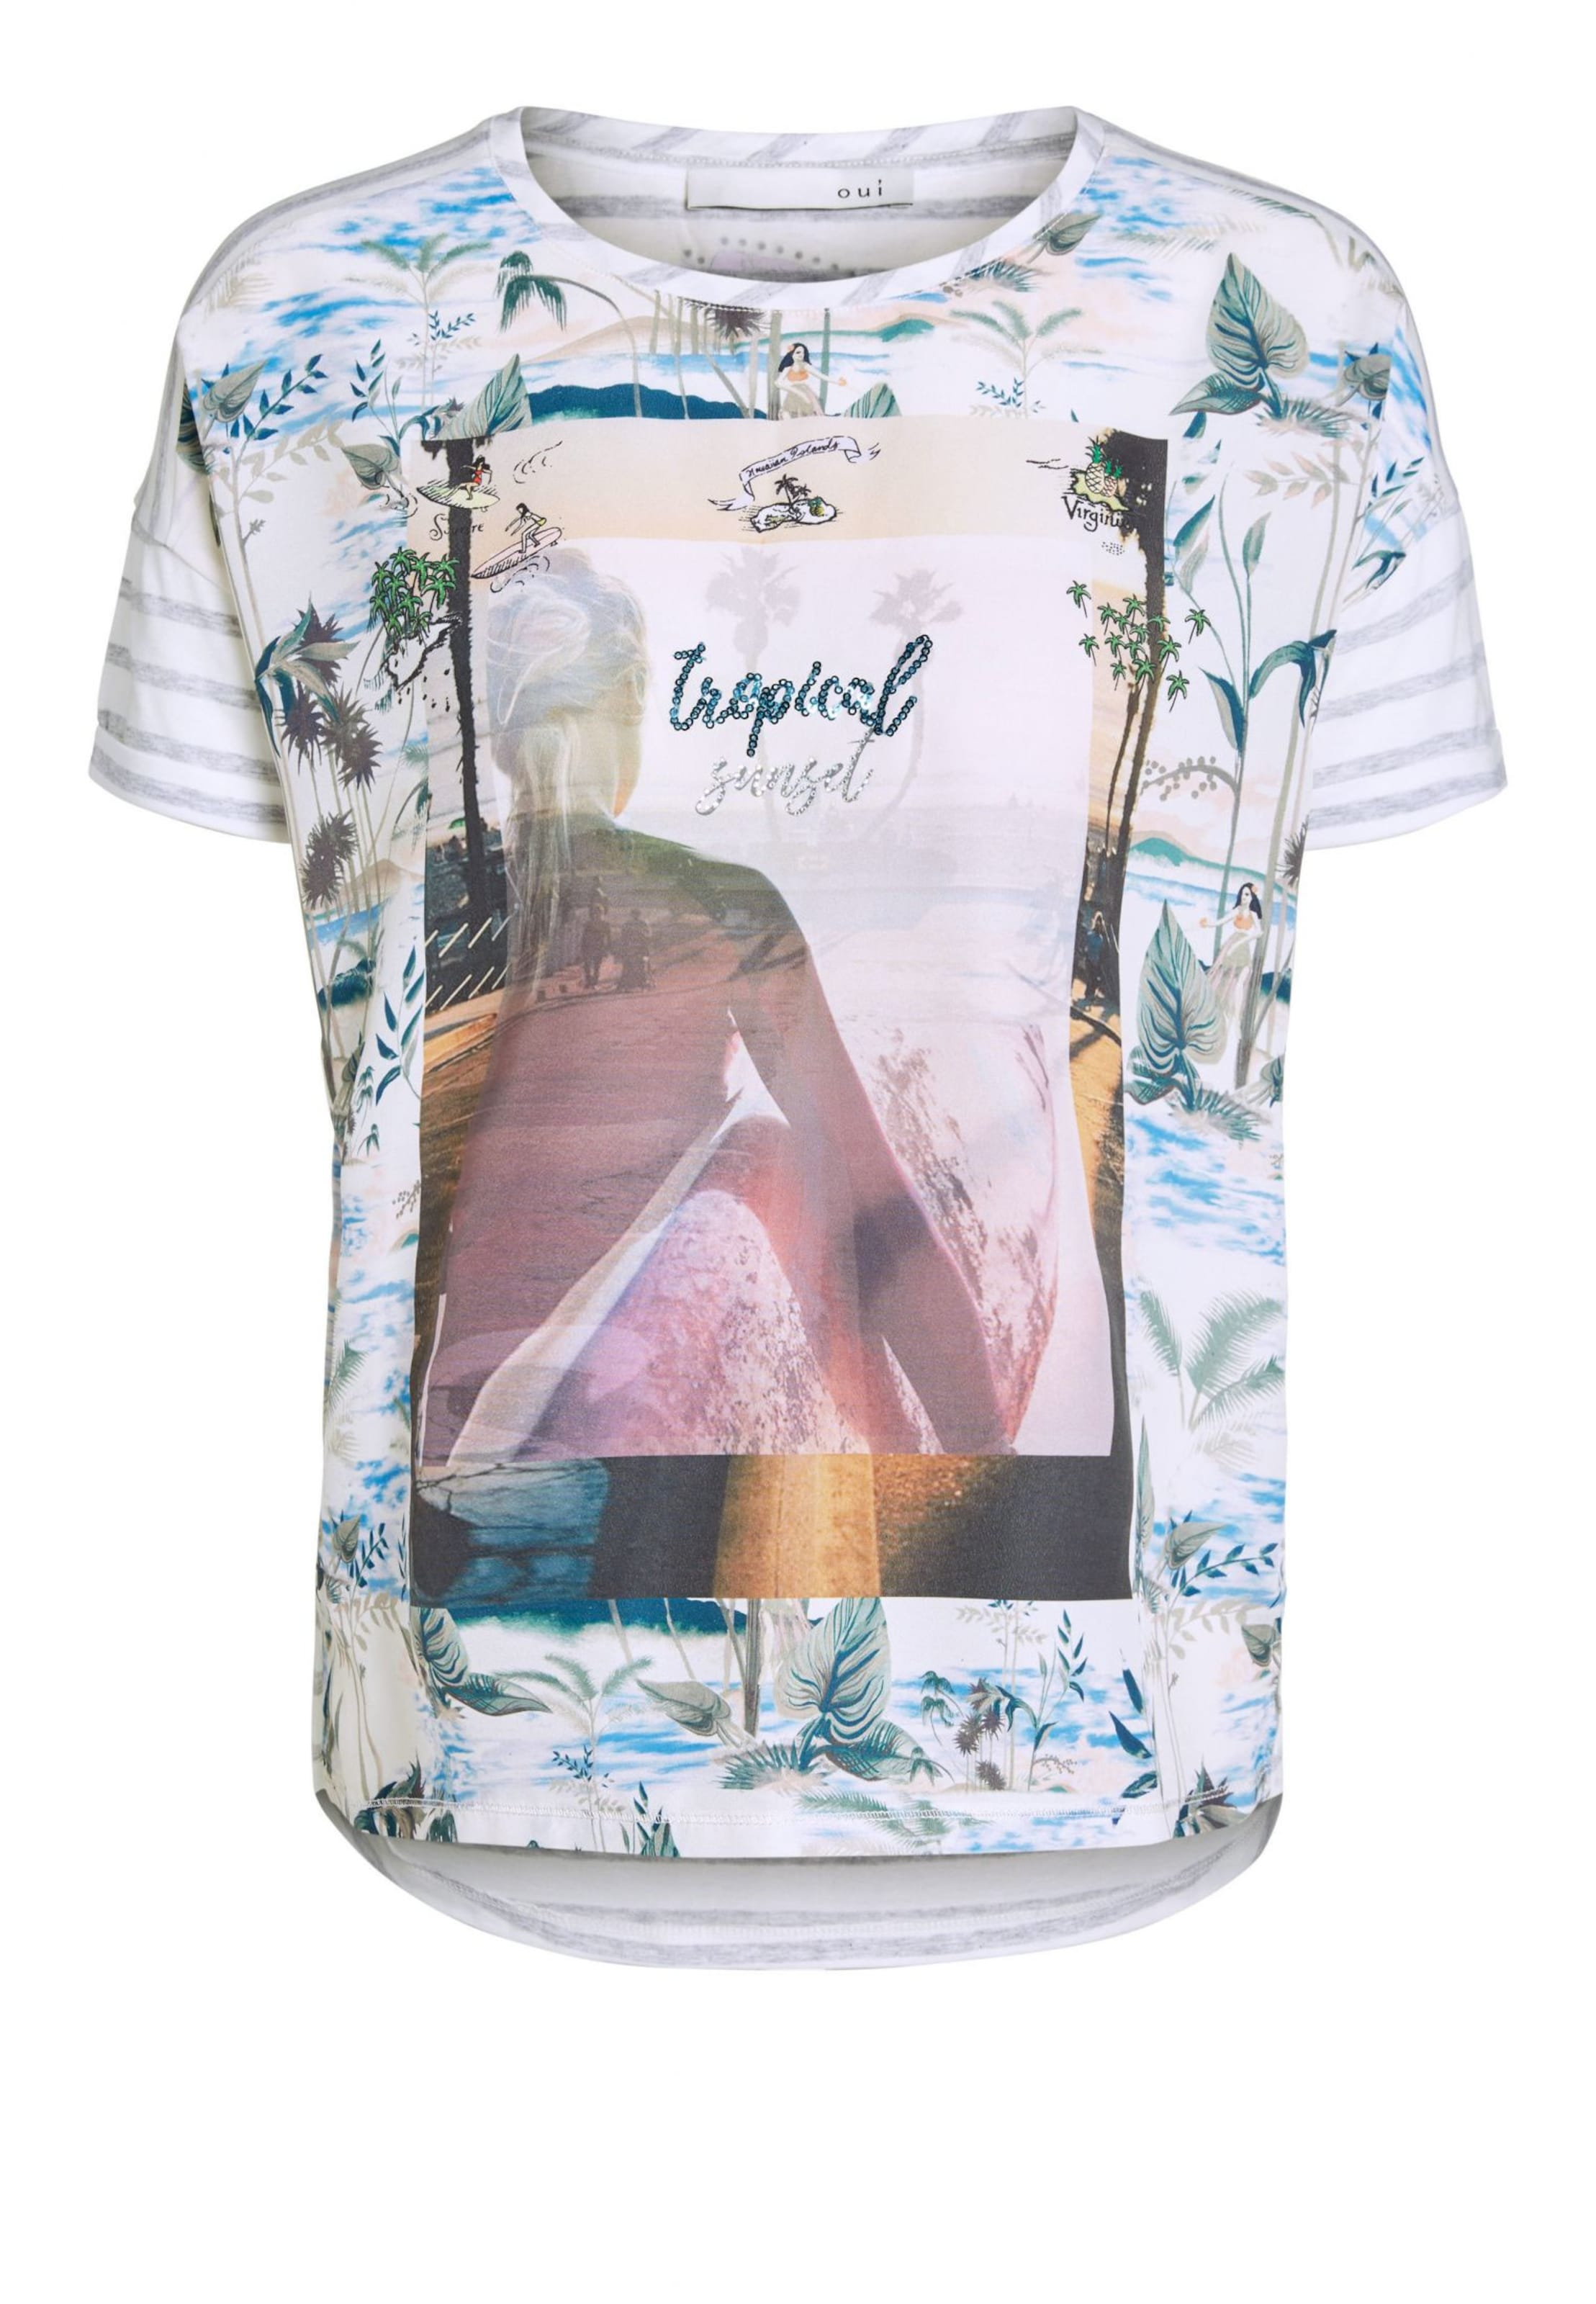 Oui T Oui In MischfarbenWeiß shirt T shirt In lFKc1JuT3